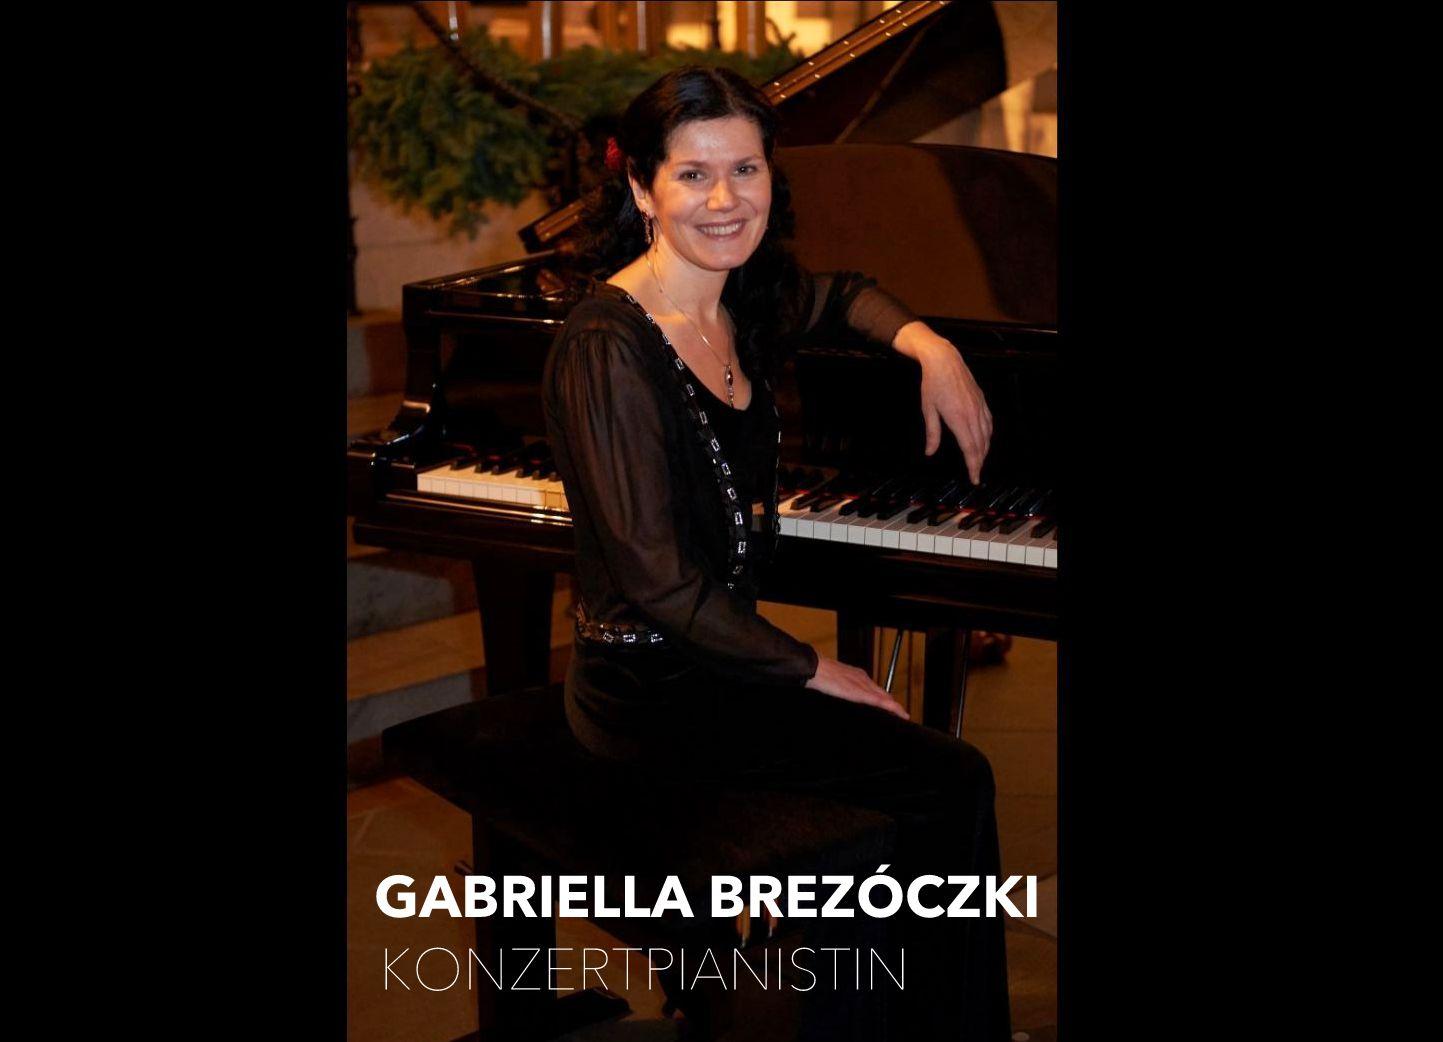 Gabriella Brezoczki